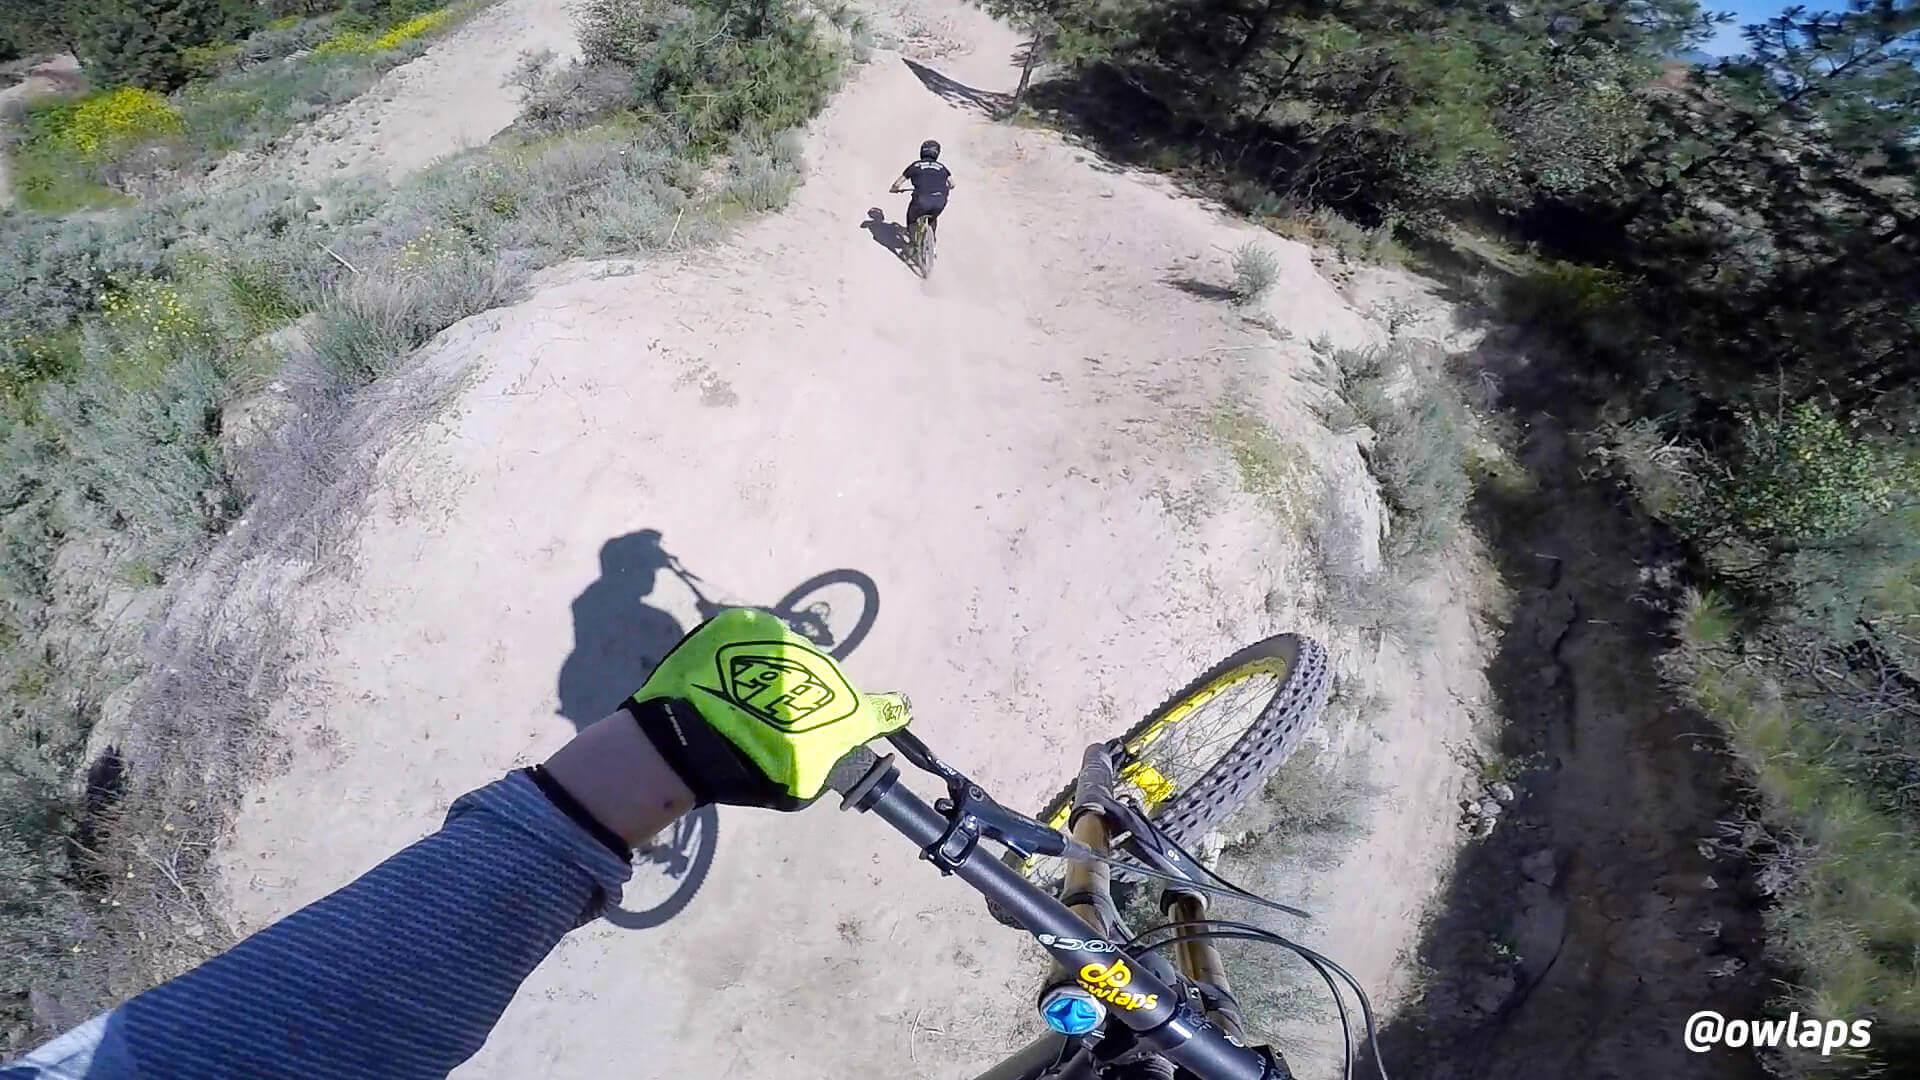 wrangler-kamloops-bike-ranch-canada-owlaps-HD-3